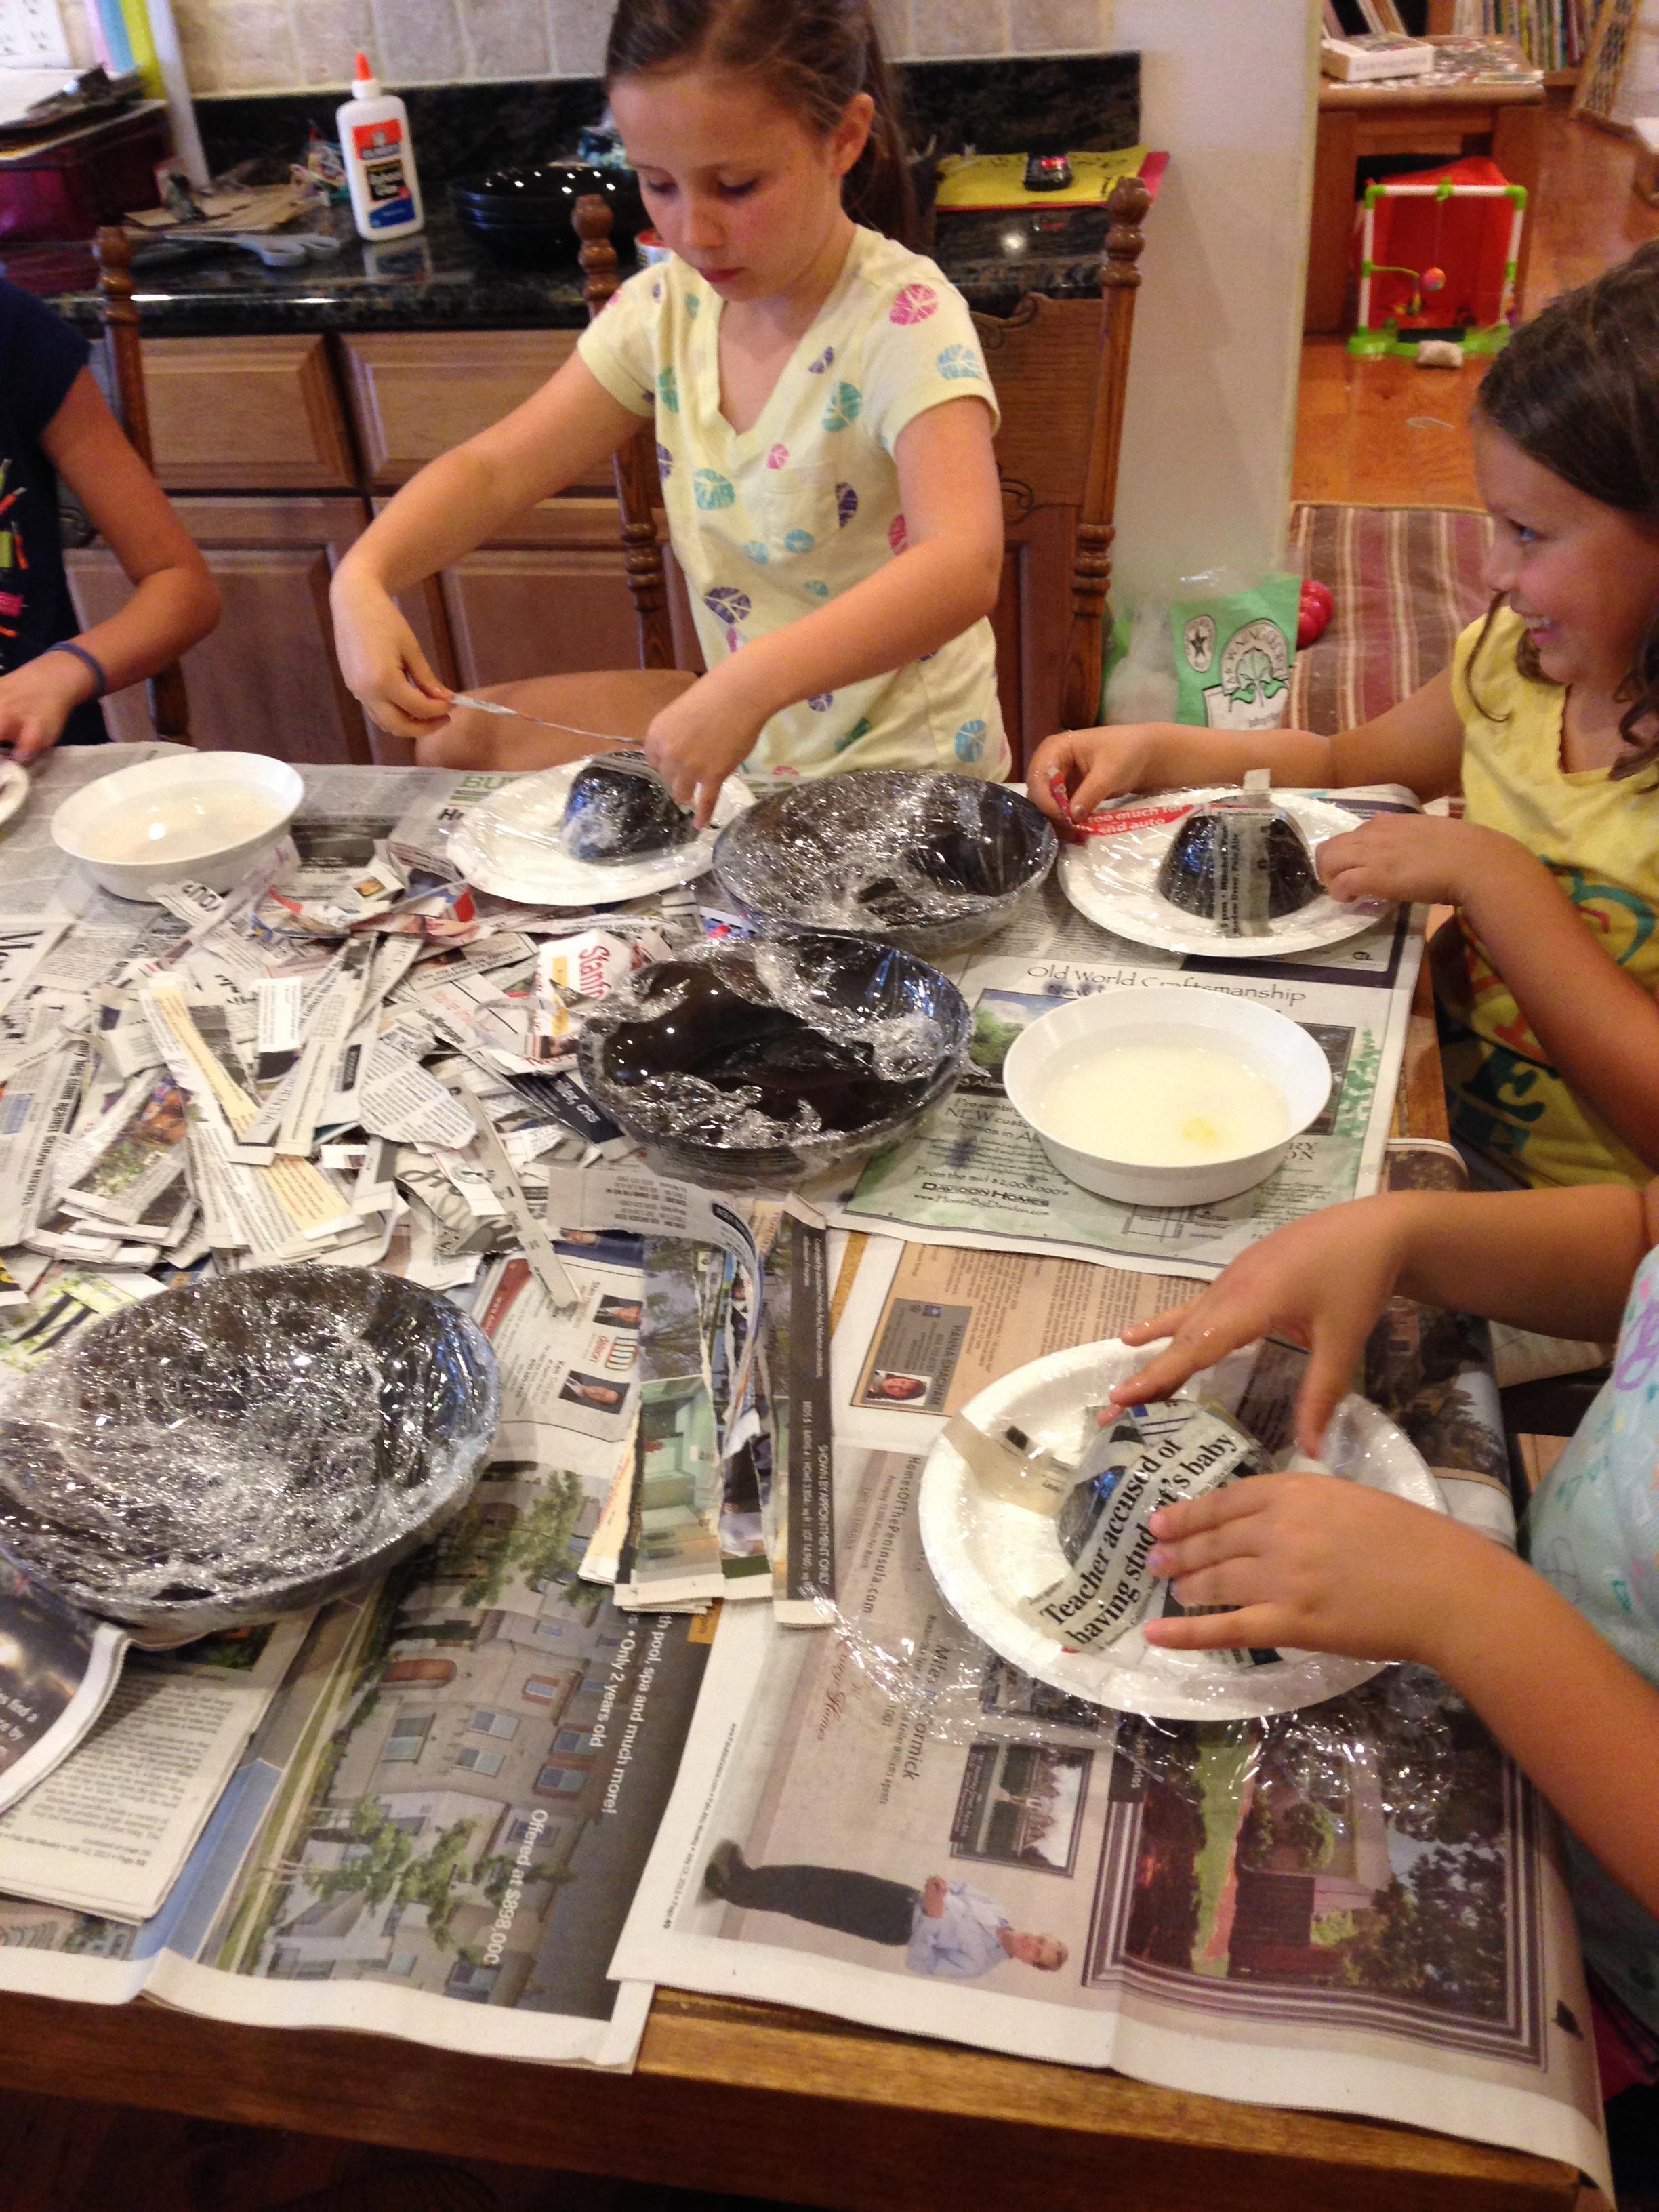 Beginnings of 3D paper mache creations